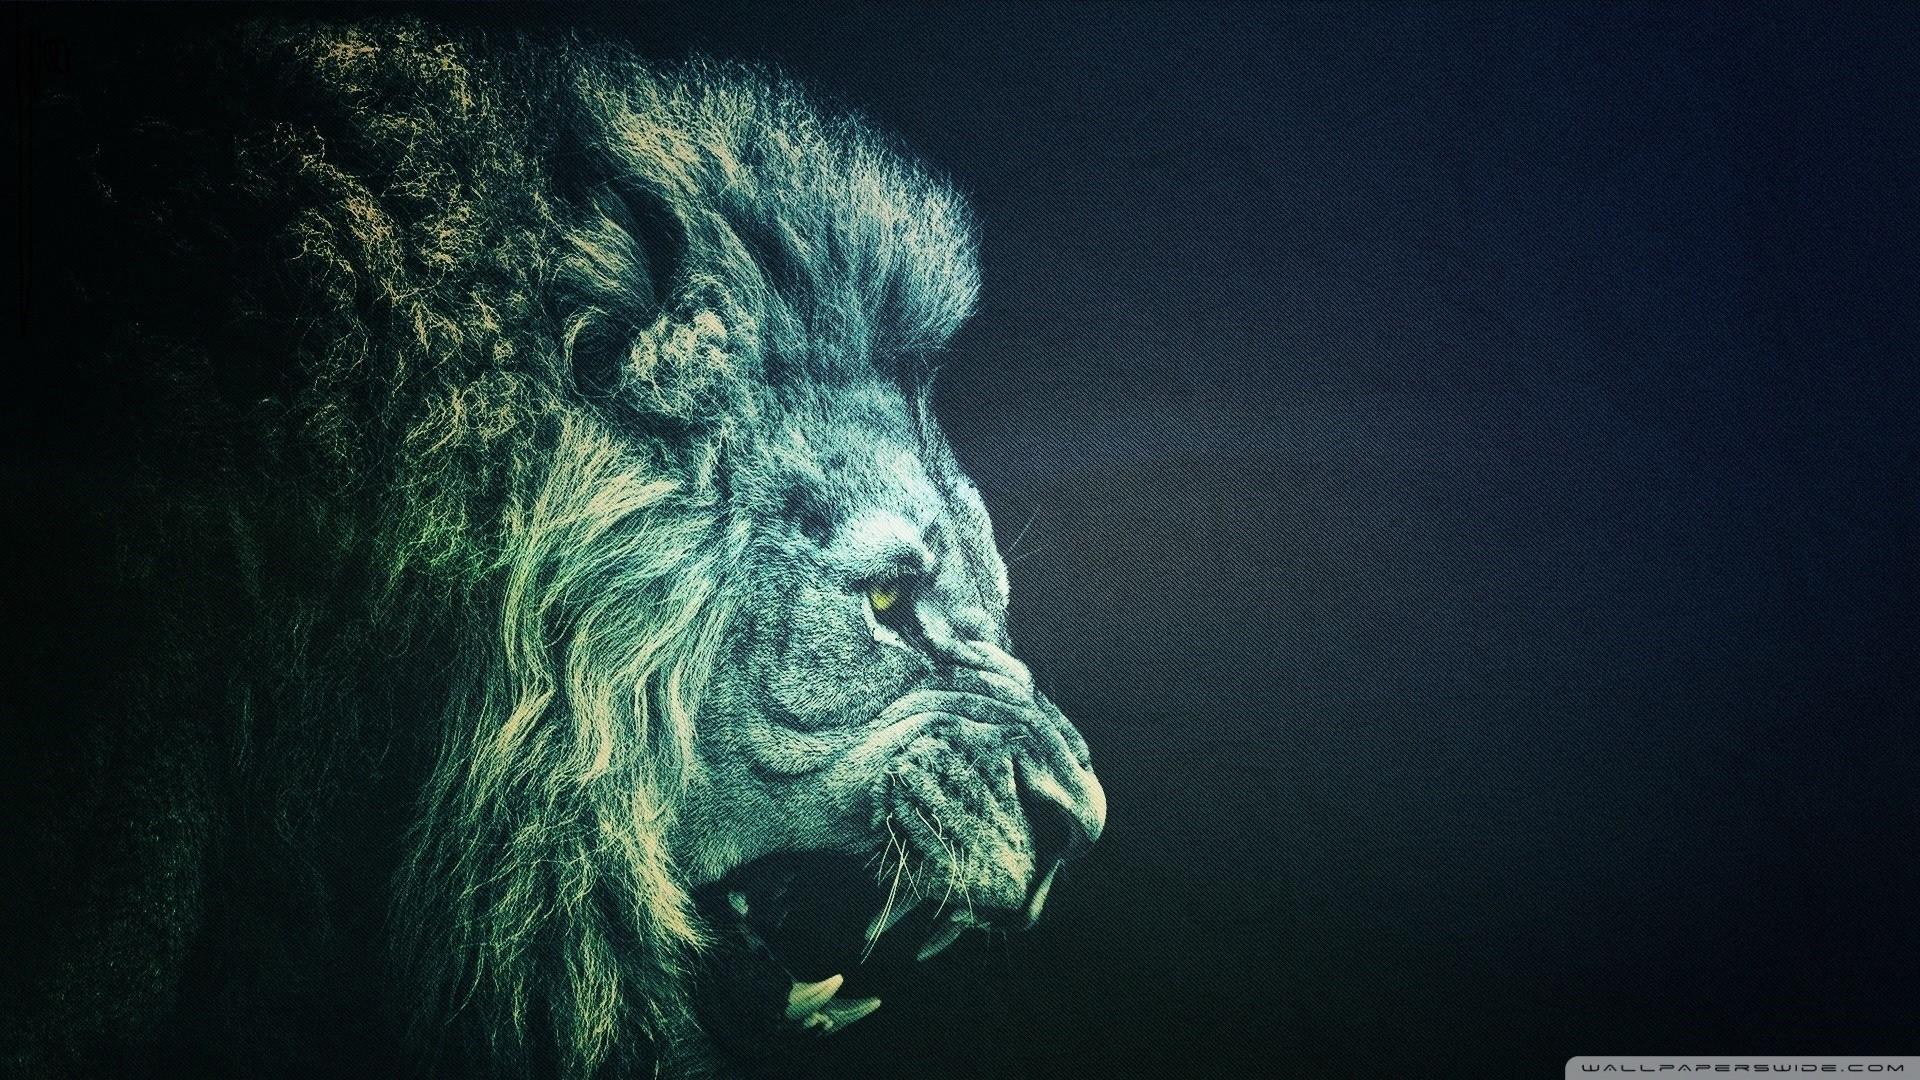 Lion Pictures Wallpaper Wallpapertag